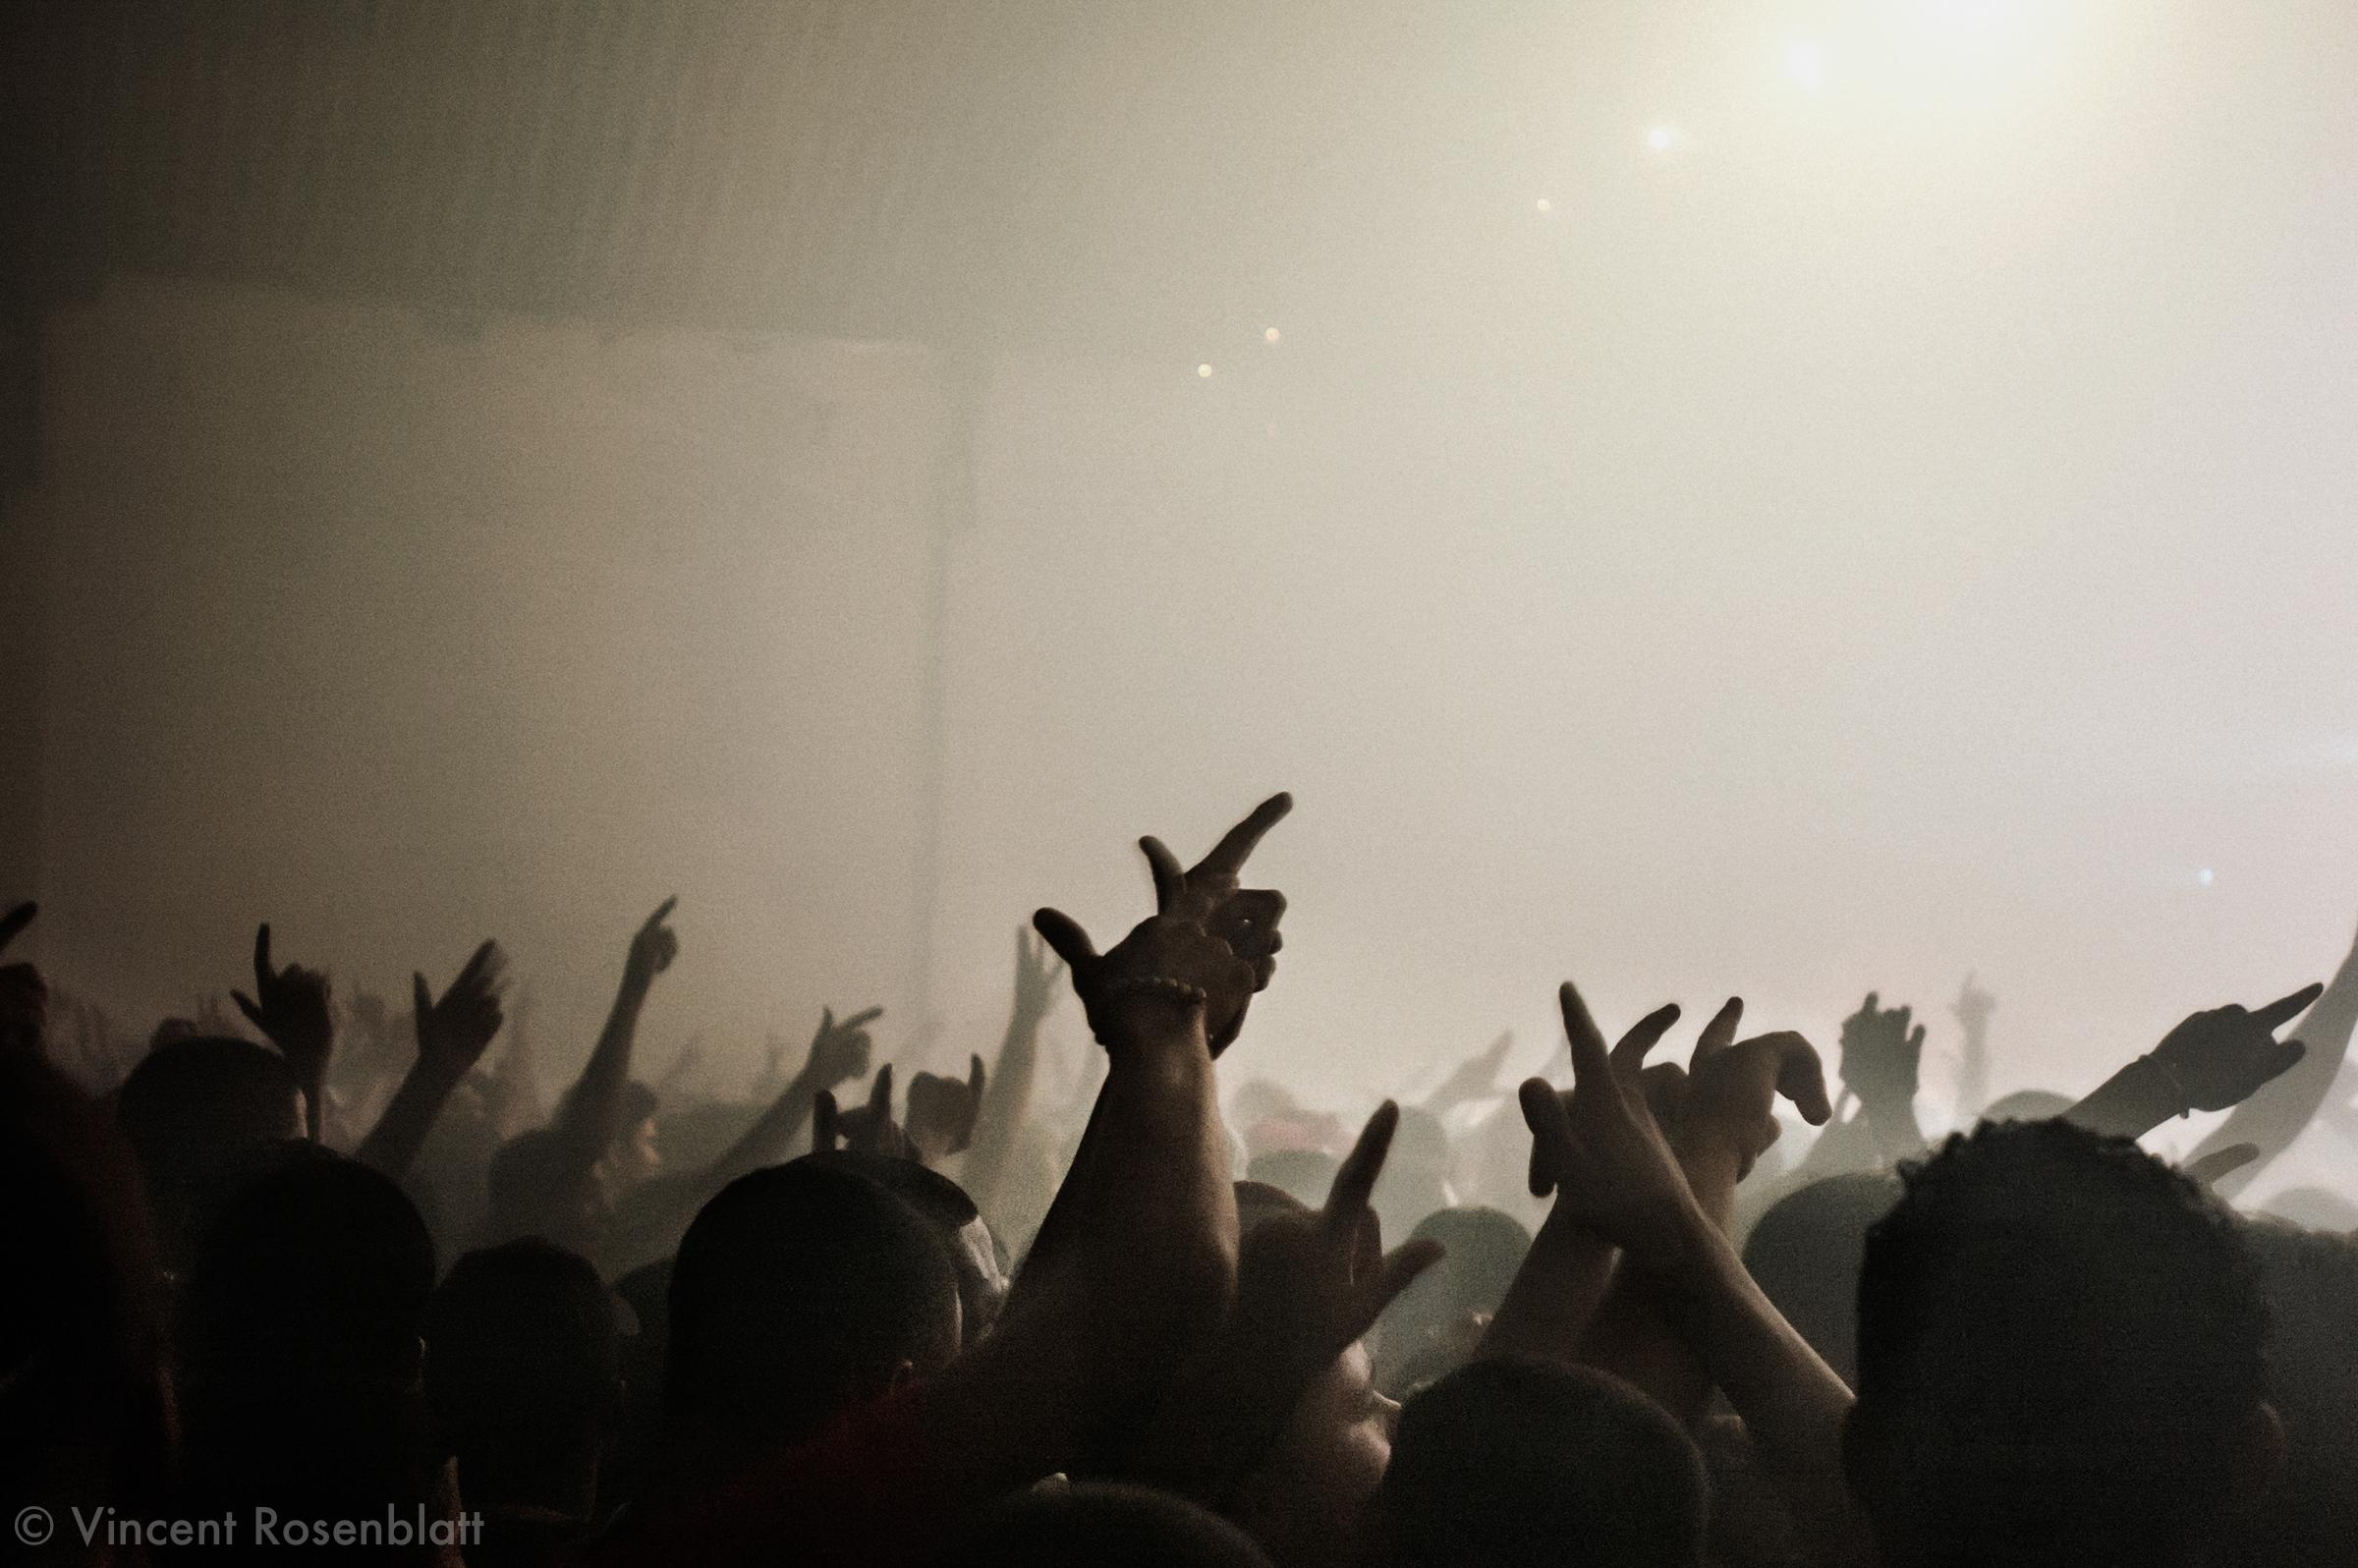 """Baile"" of Furacão Tsunami, the most powerful soundsystem on the Funk scene in Rio. Campo do Ferroviario, Austin, Rio de Janeiro 2006."